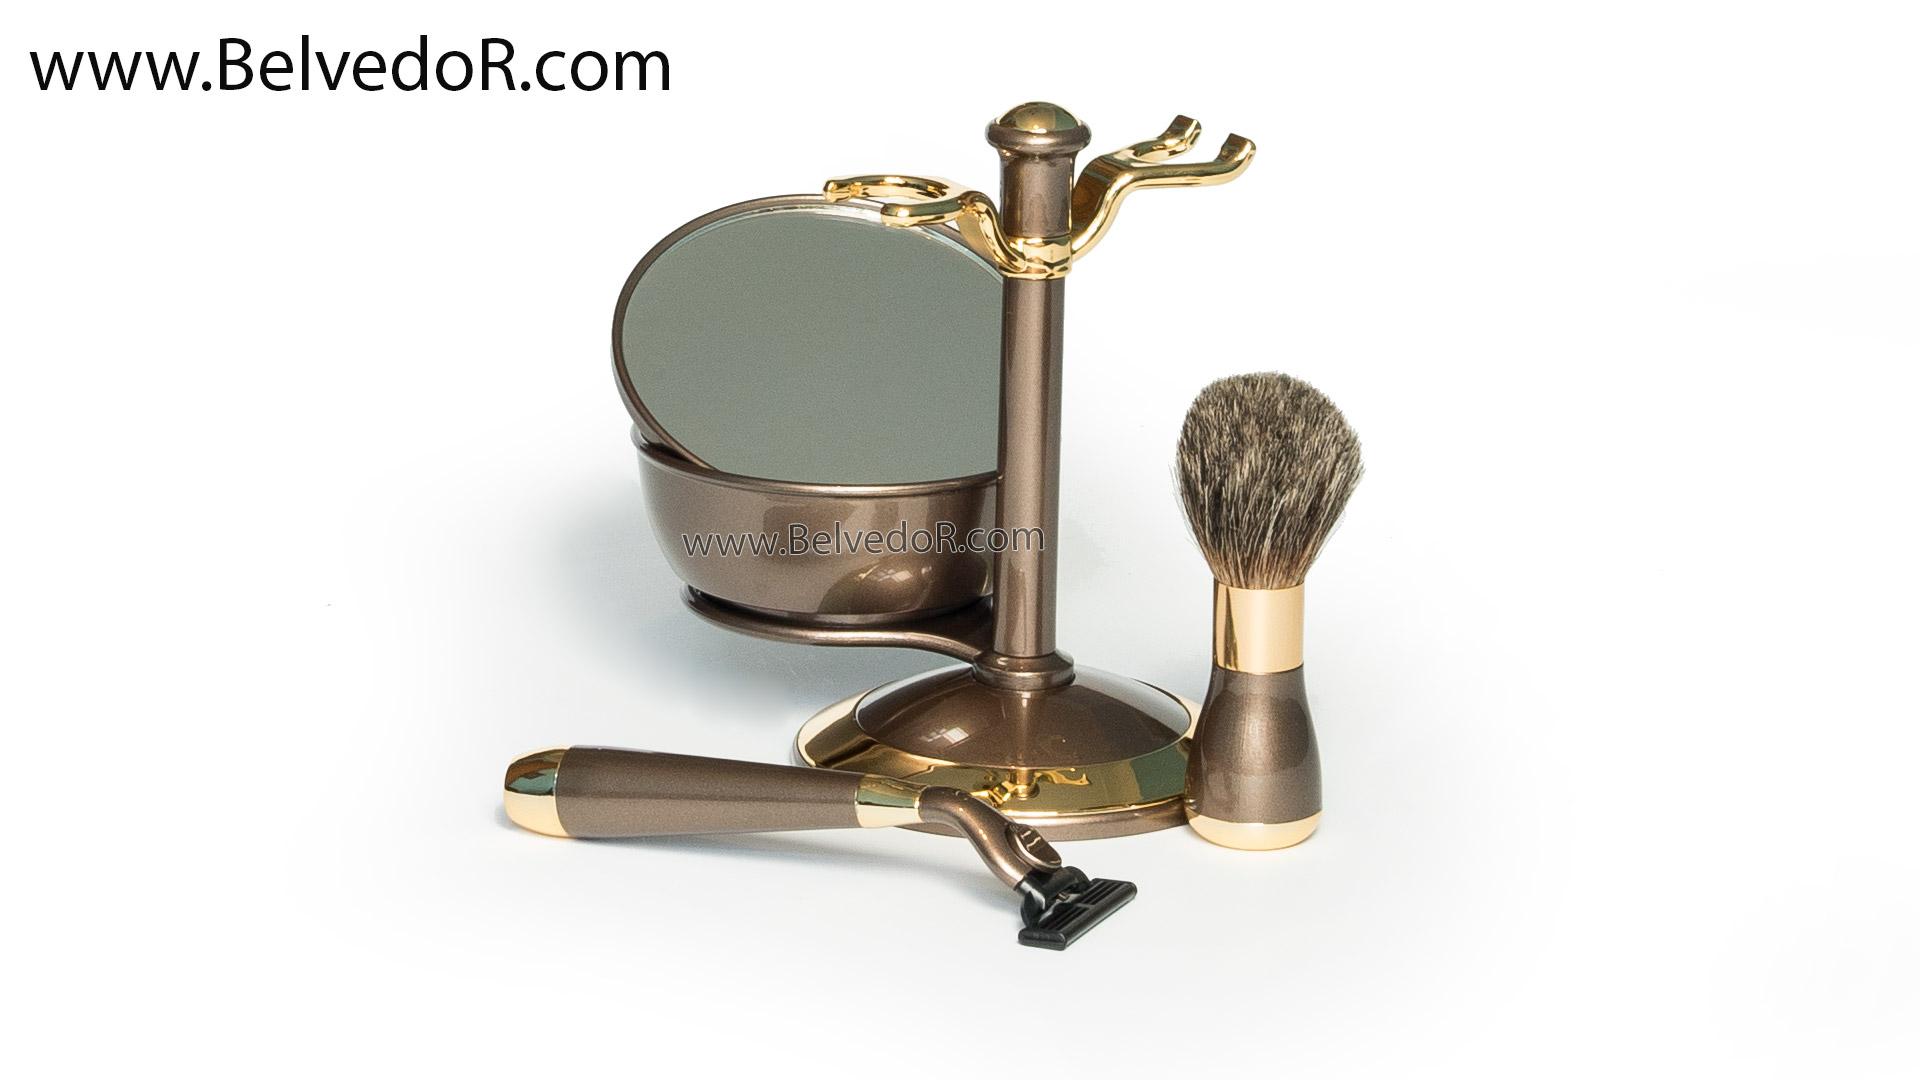 Набор для бритья Mss 90232 Brz/g Bronze&gold (gillette Mach-3)